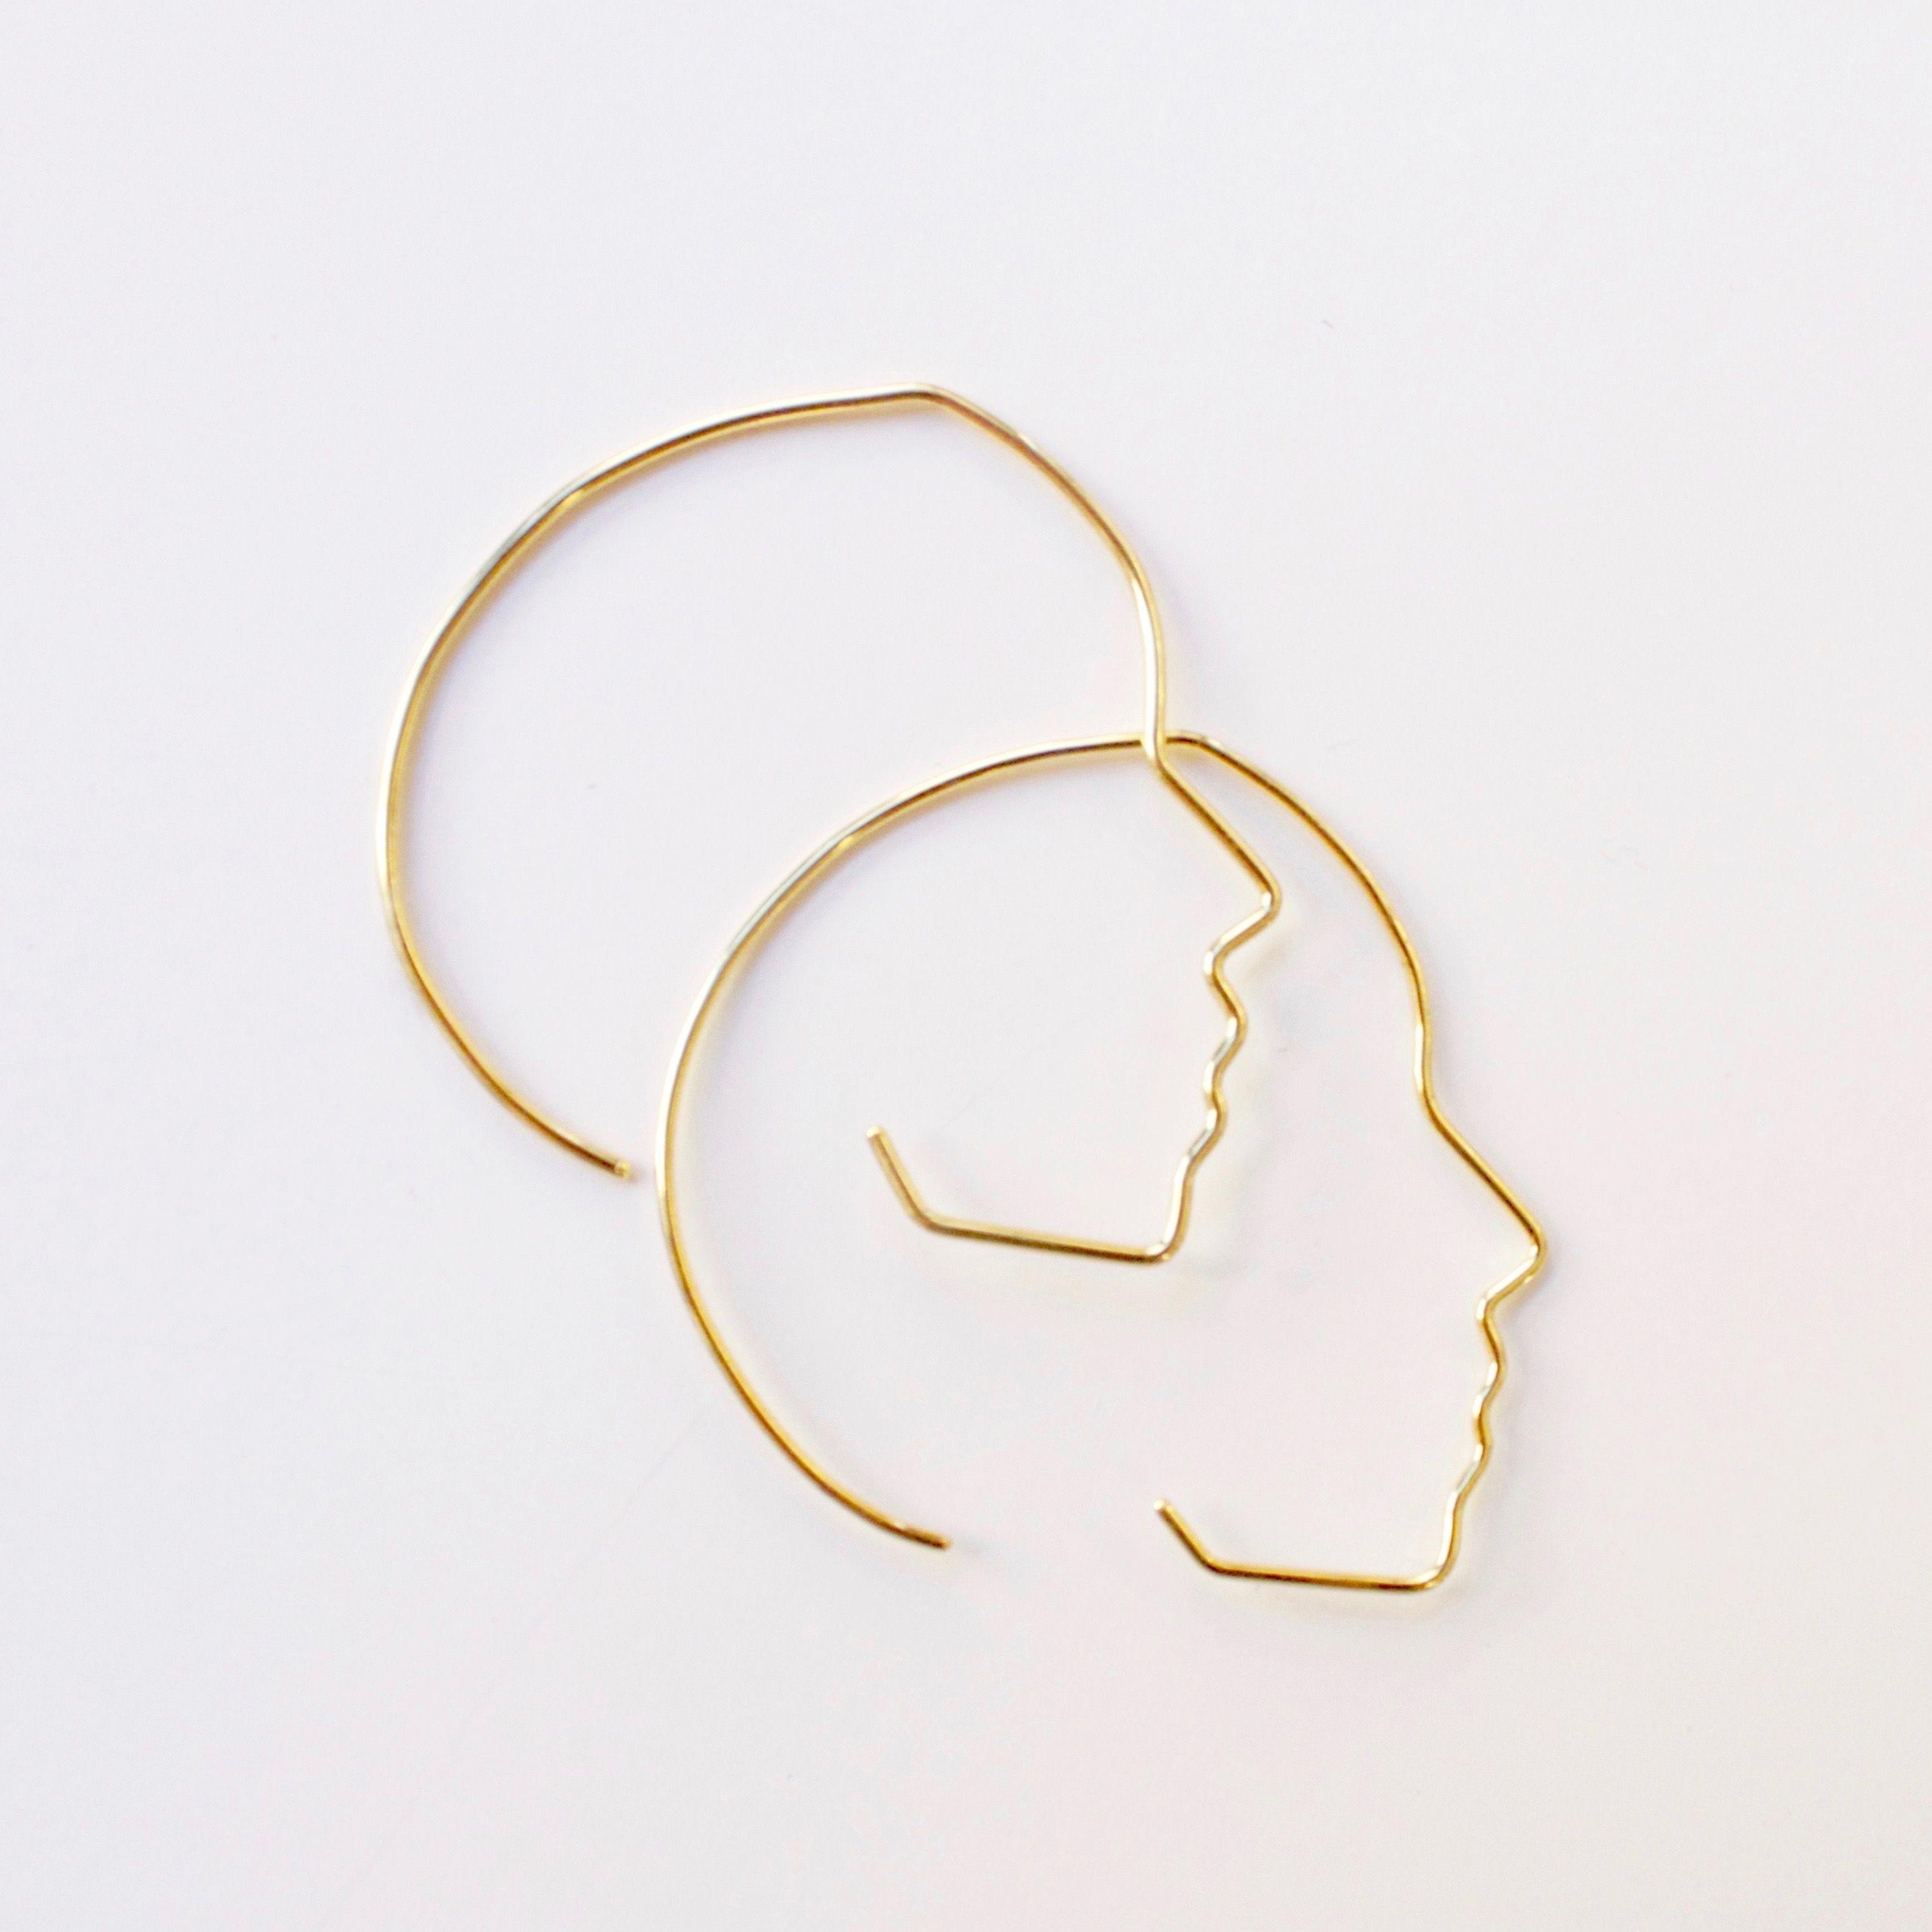 Die Motte 100% hand Made in Barcelona | Jewellery | Pinterest ...